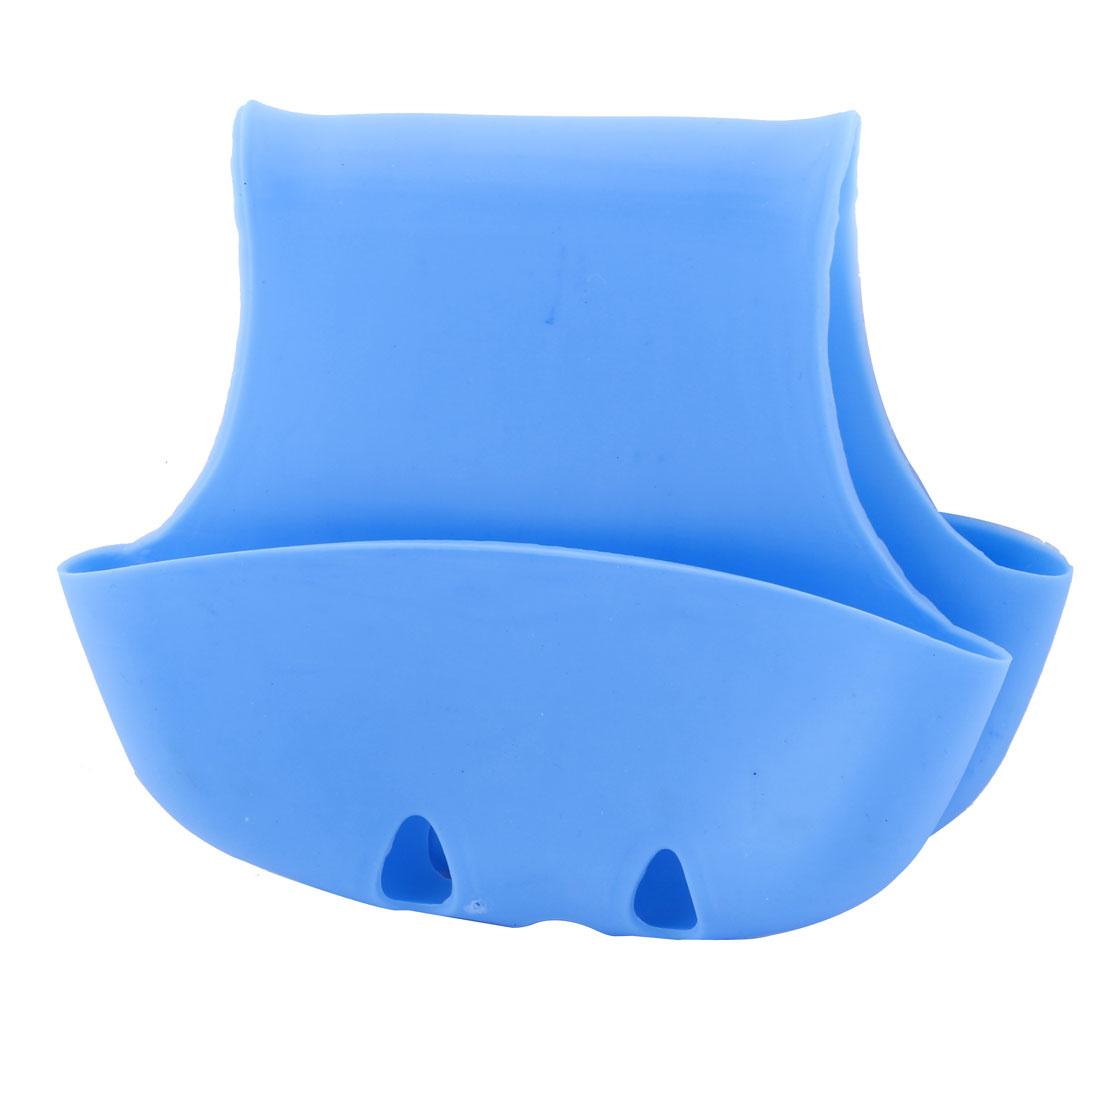 Saddle Style Sink Faucet Dish Washing Tool Sponge Drainer Holder Basket Blue